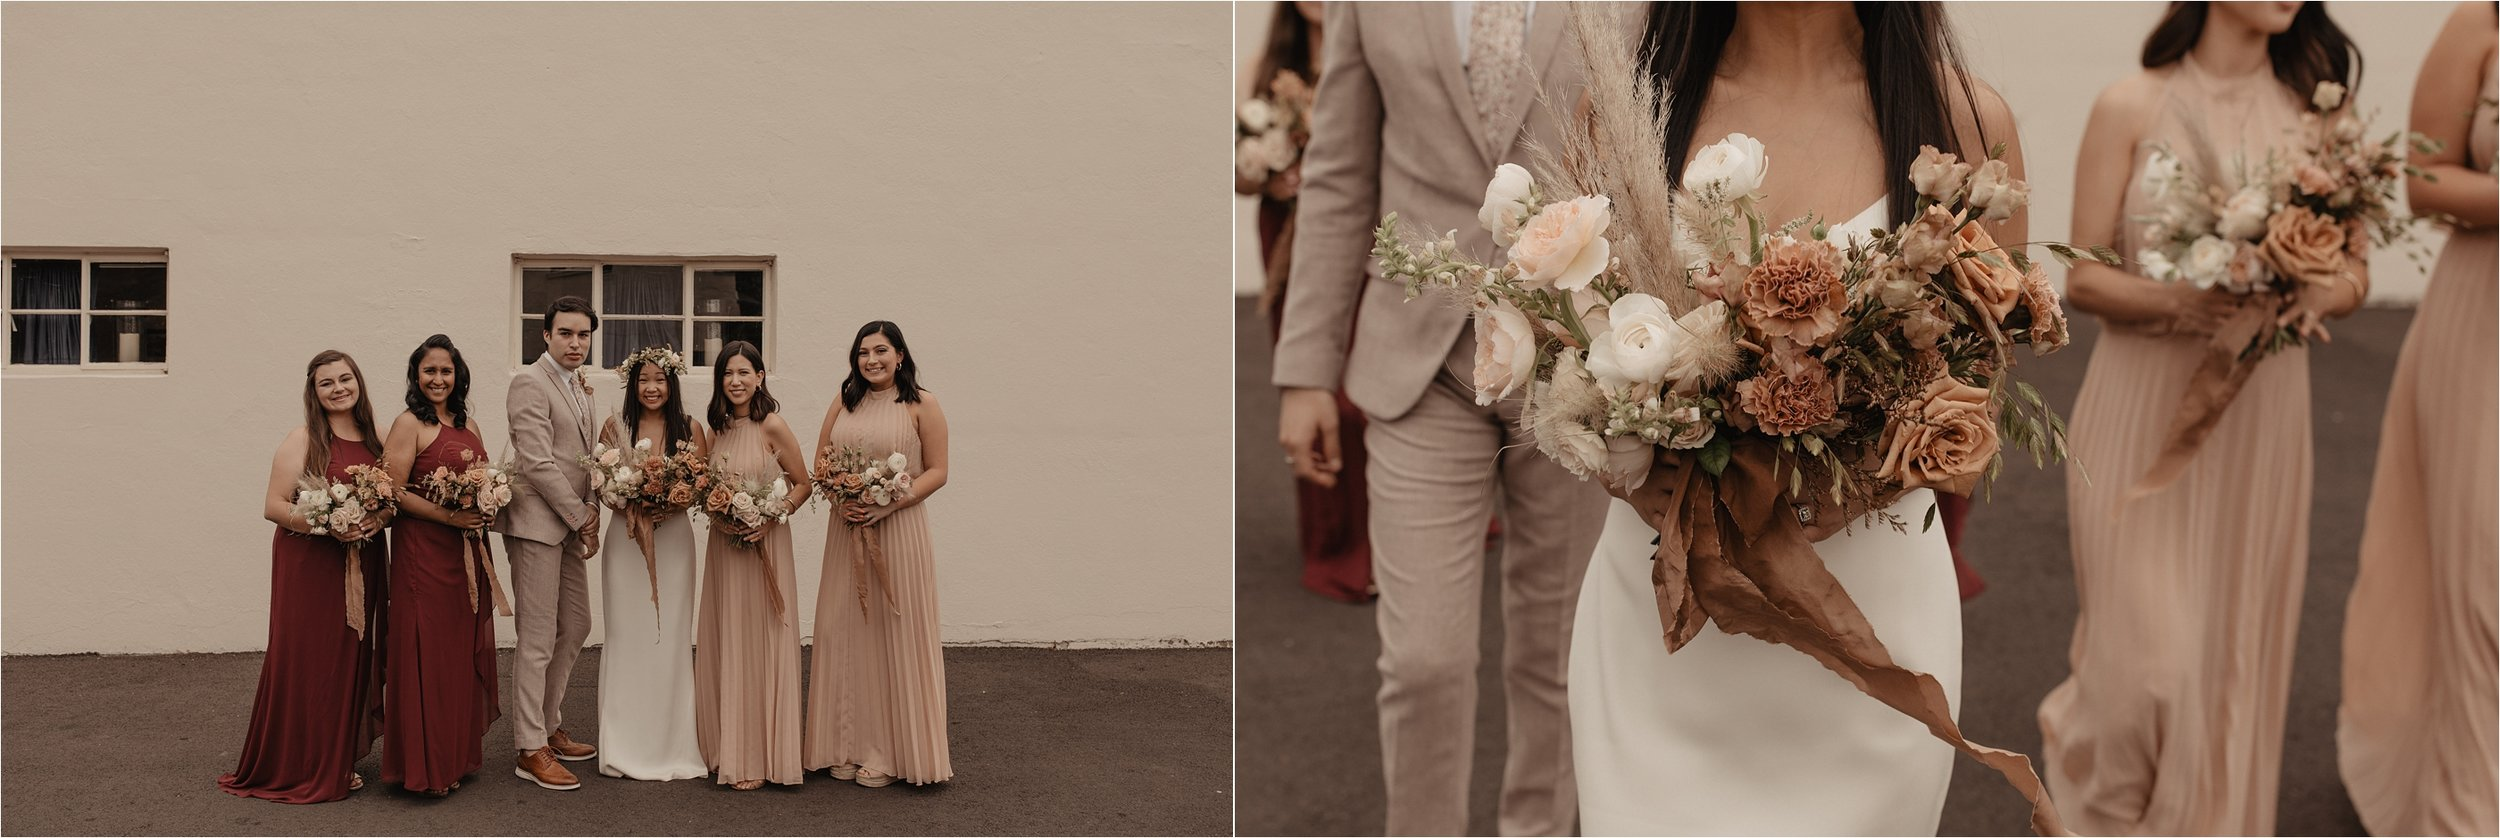 intimate-portland-modern-trendy-wedding_0042.jpg